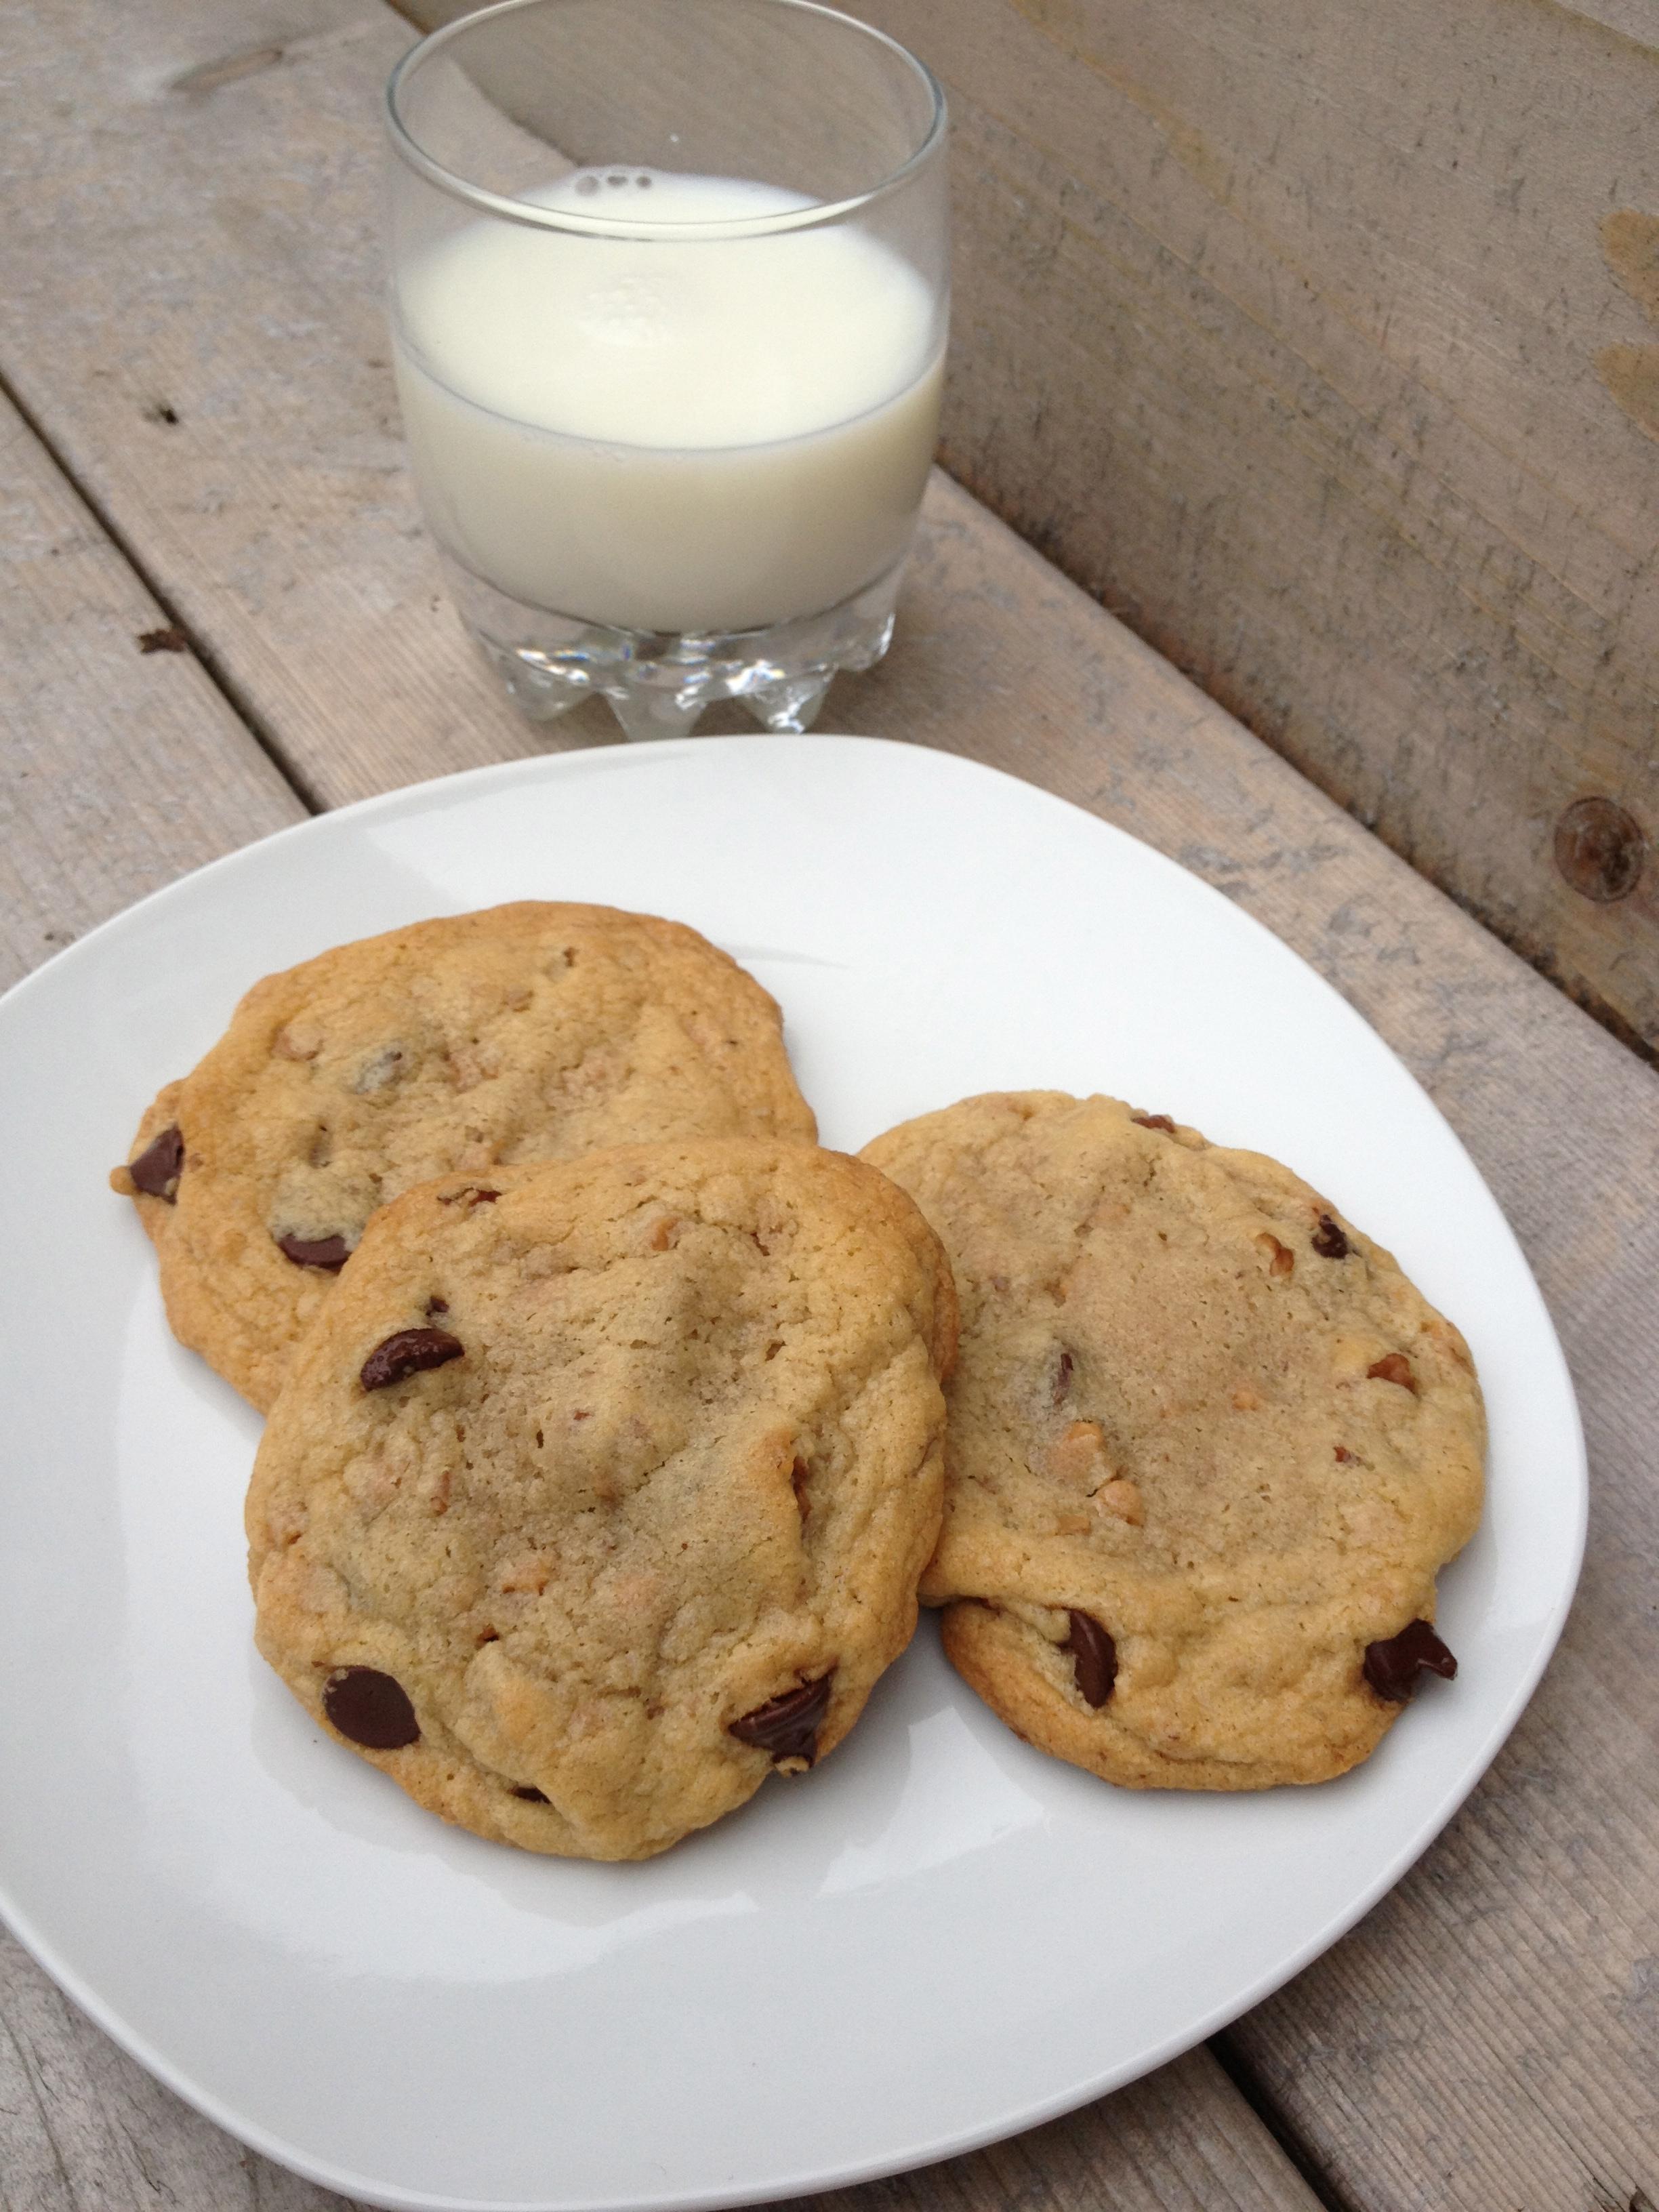 Pecan Toffee Chocolate Chip Cookies